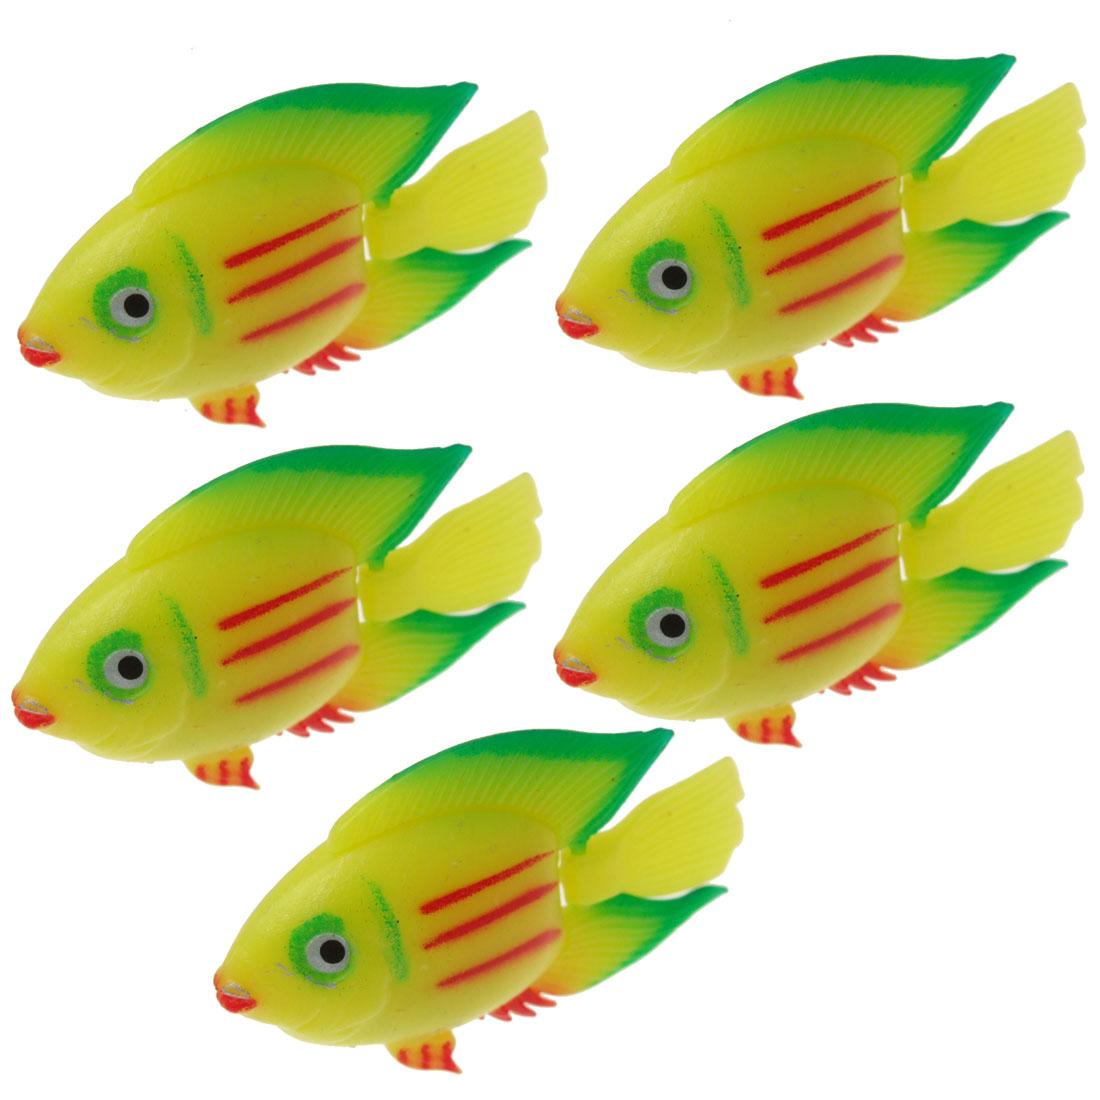 Plastic Aquarium Mini Fish Water Tank Decor Ornament